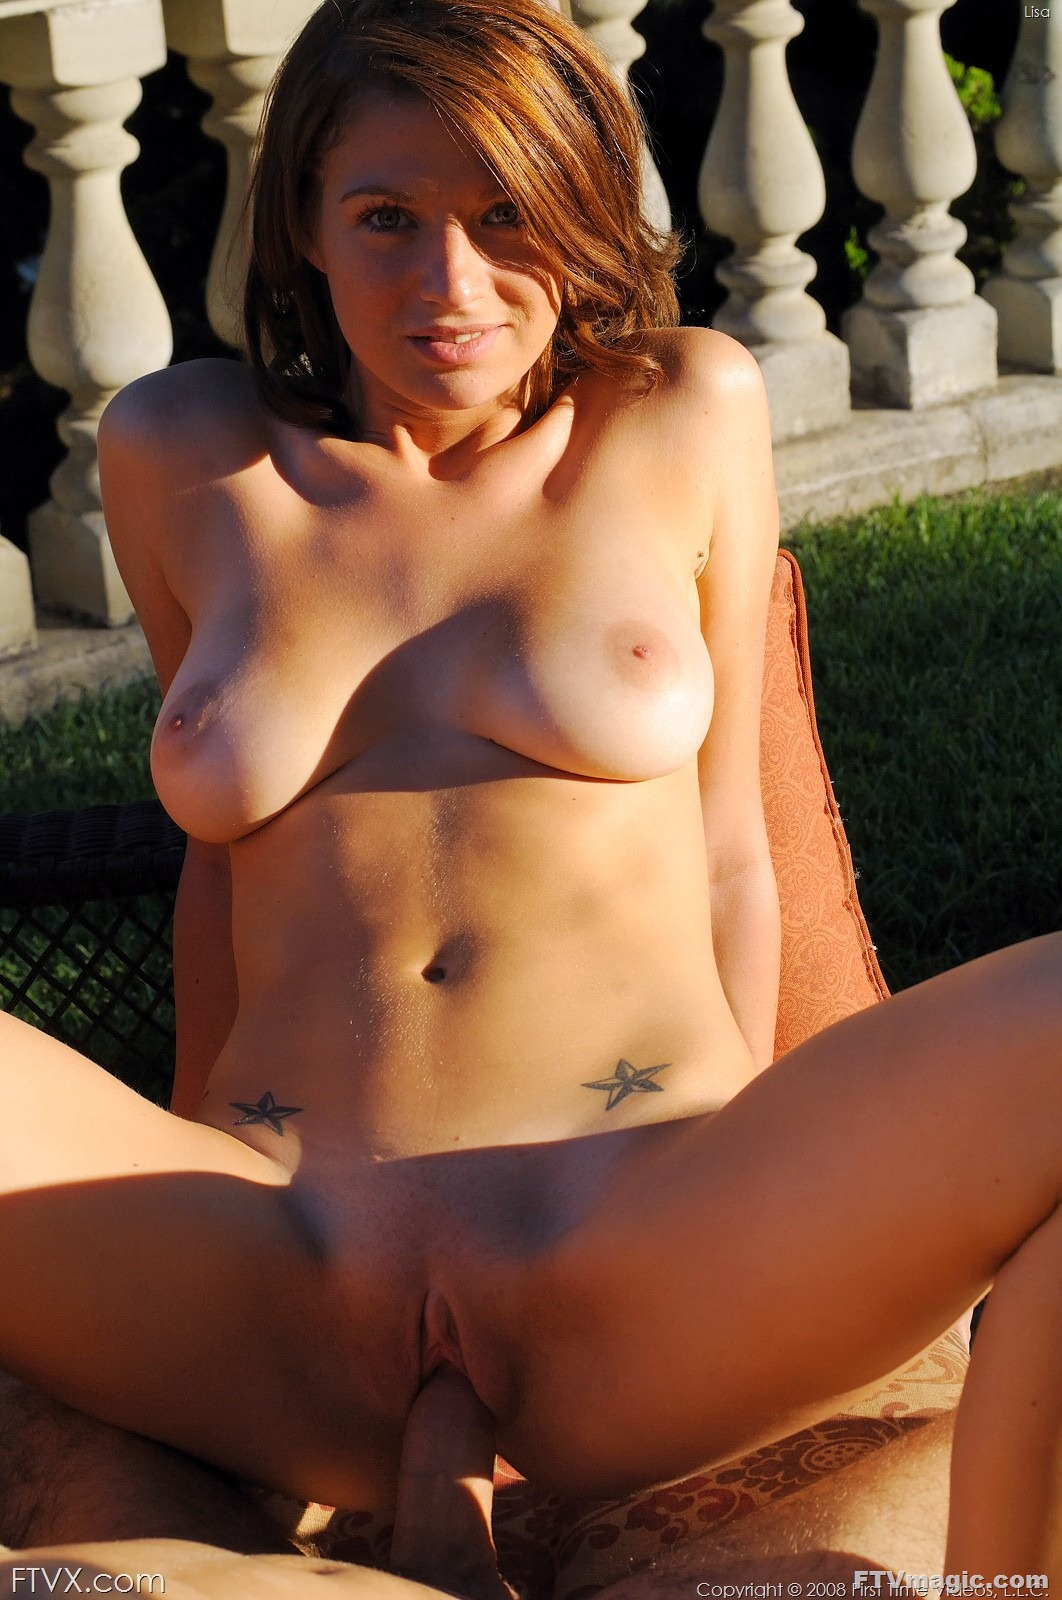 Big tits at work daphne rosen